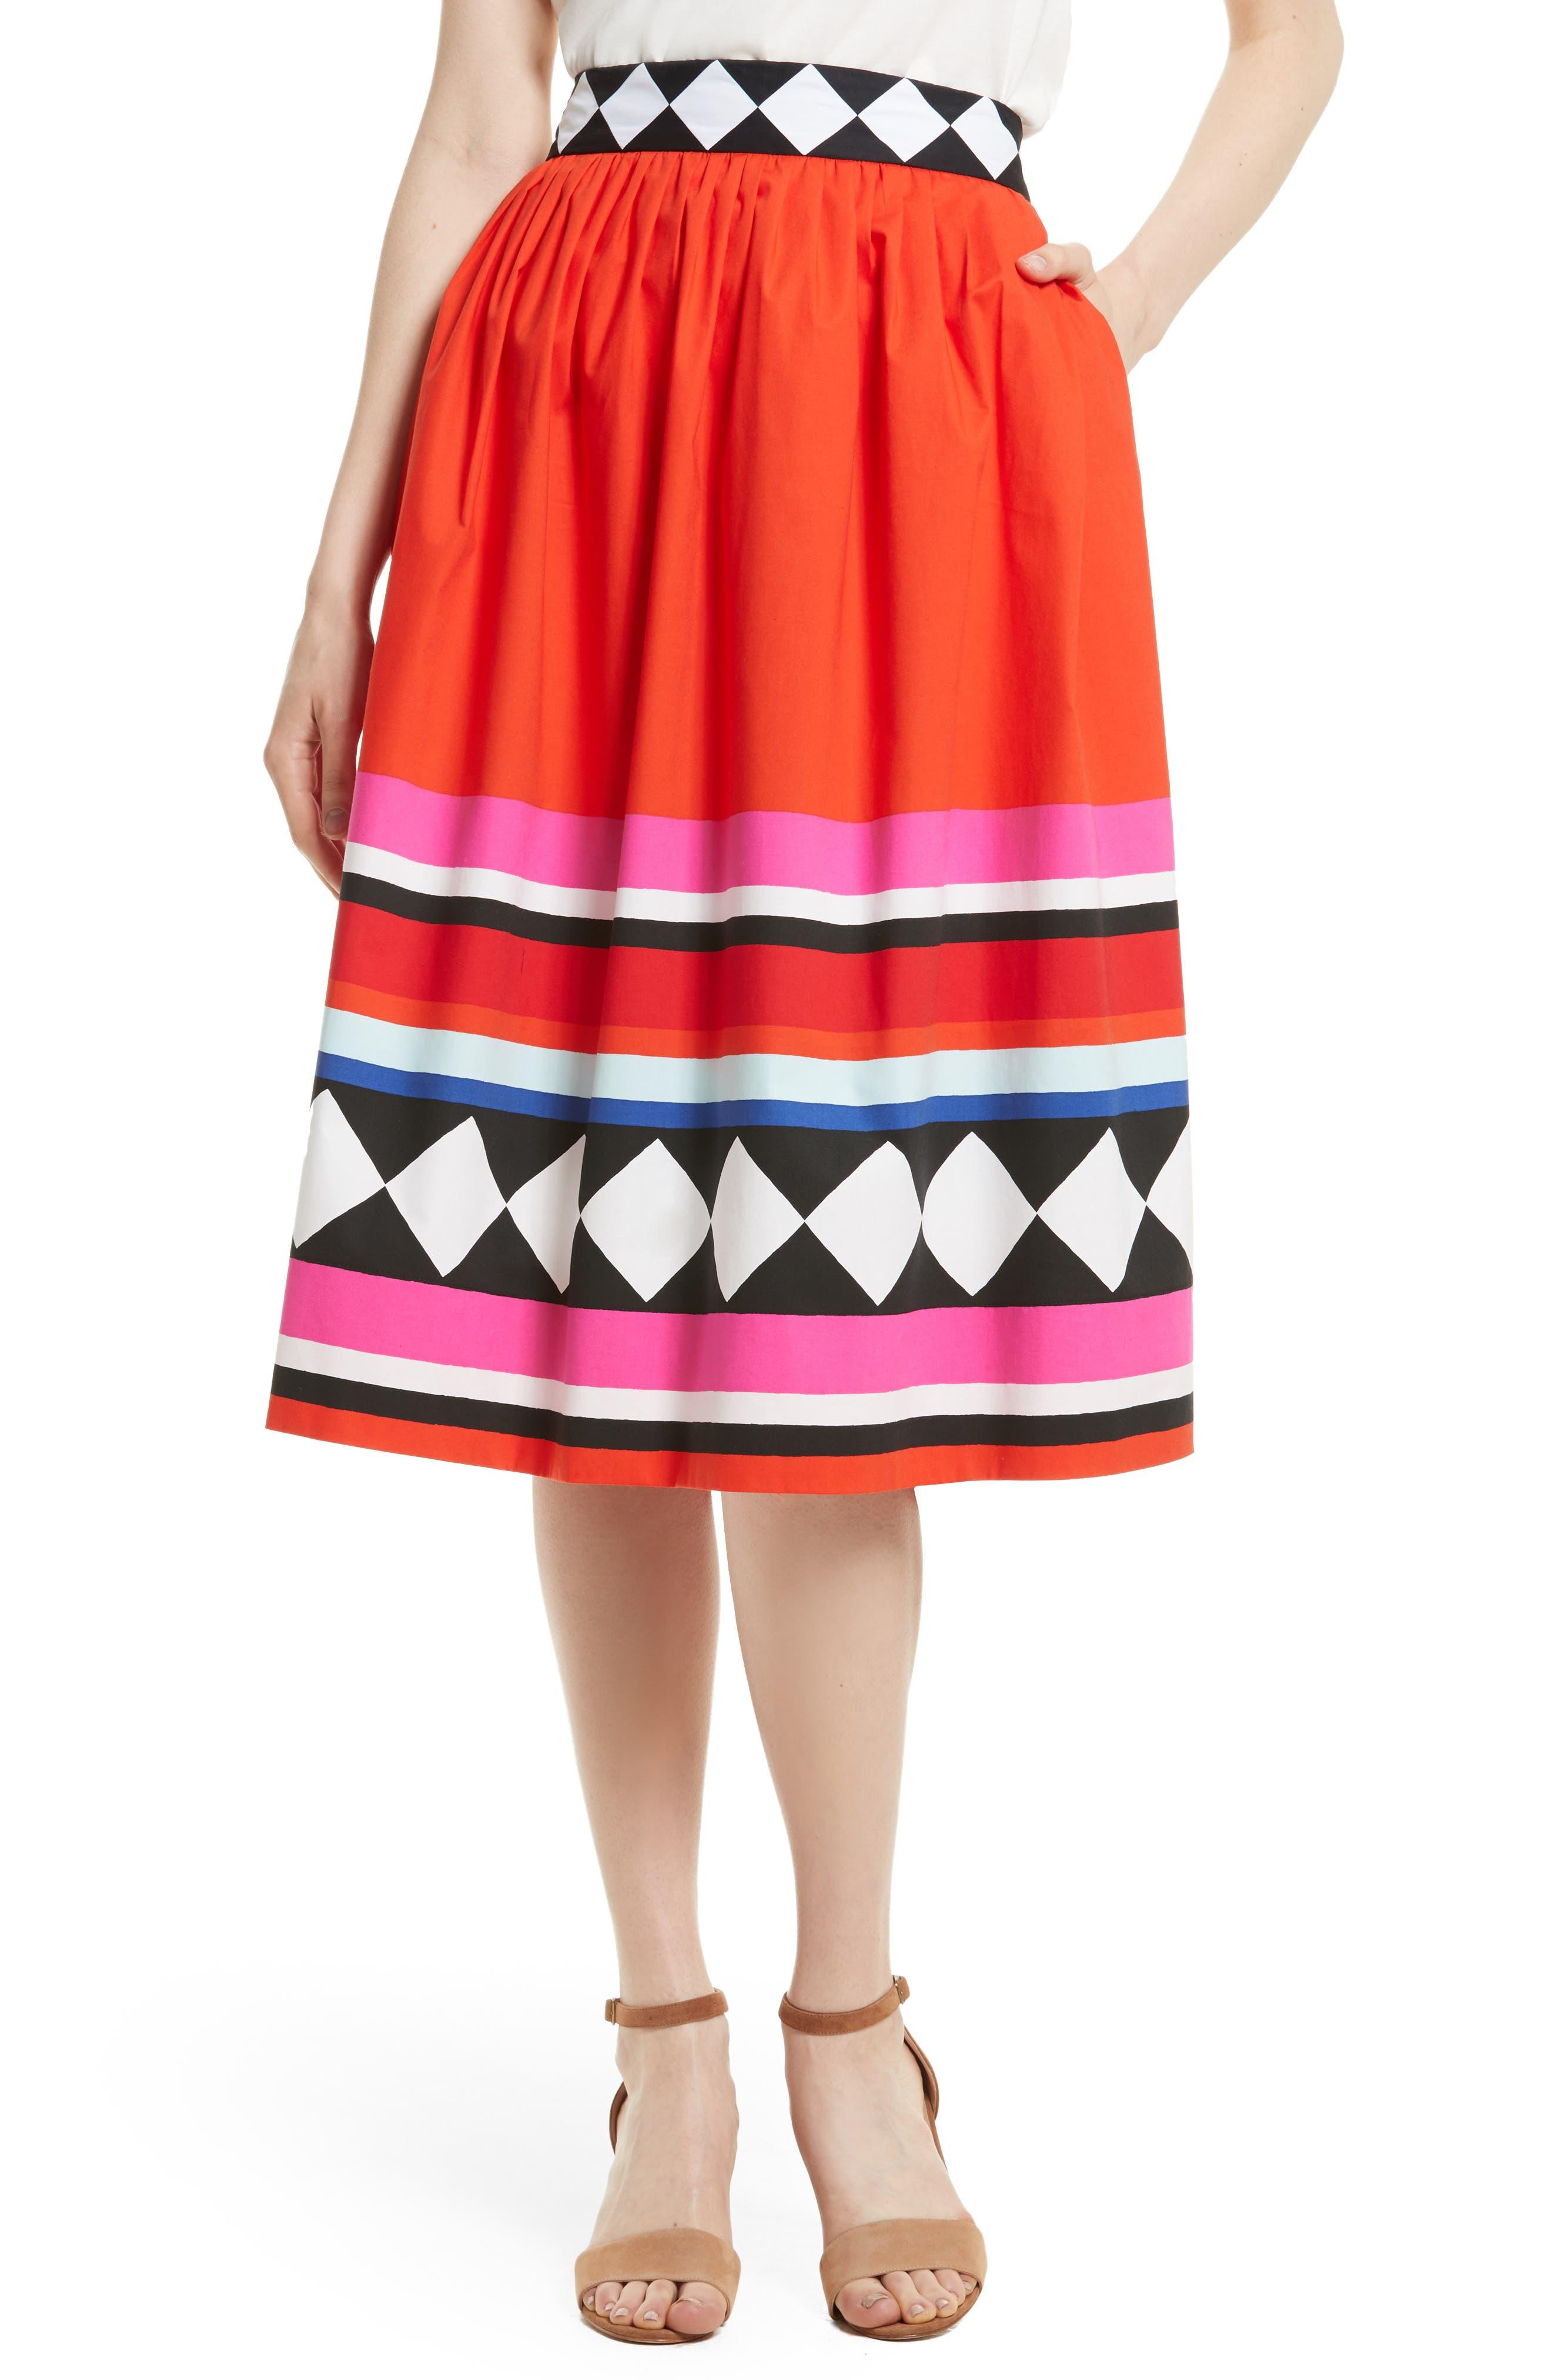 KATE SPADE NEW YORK cotton poplin midi skirt